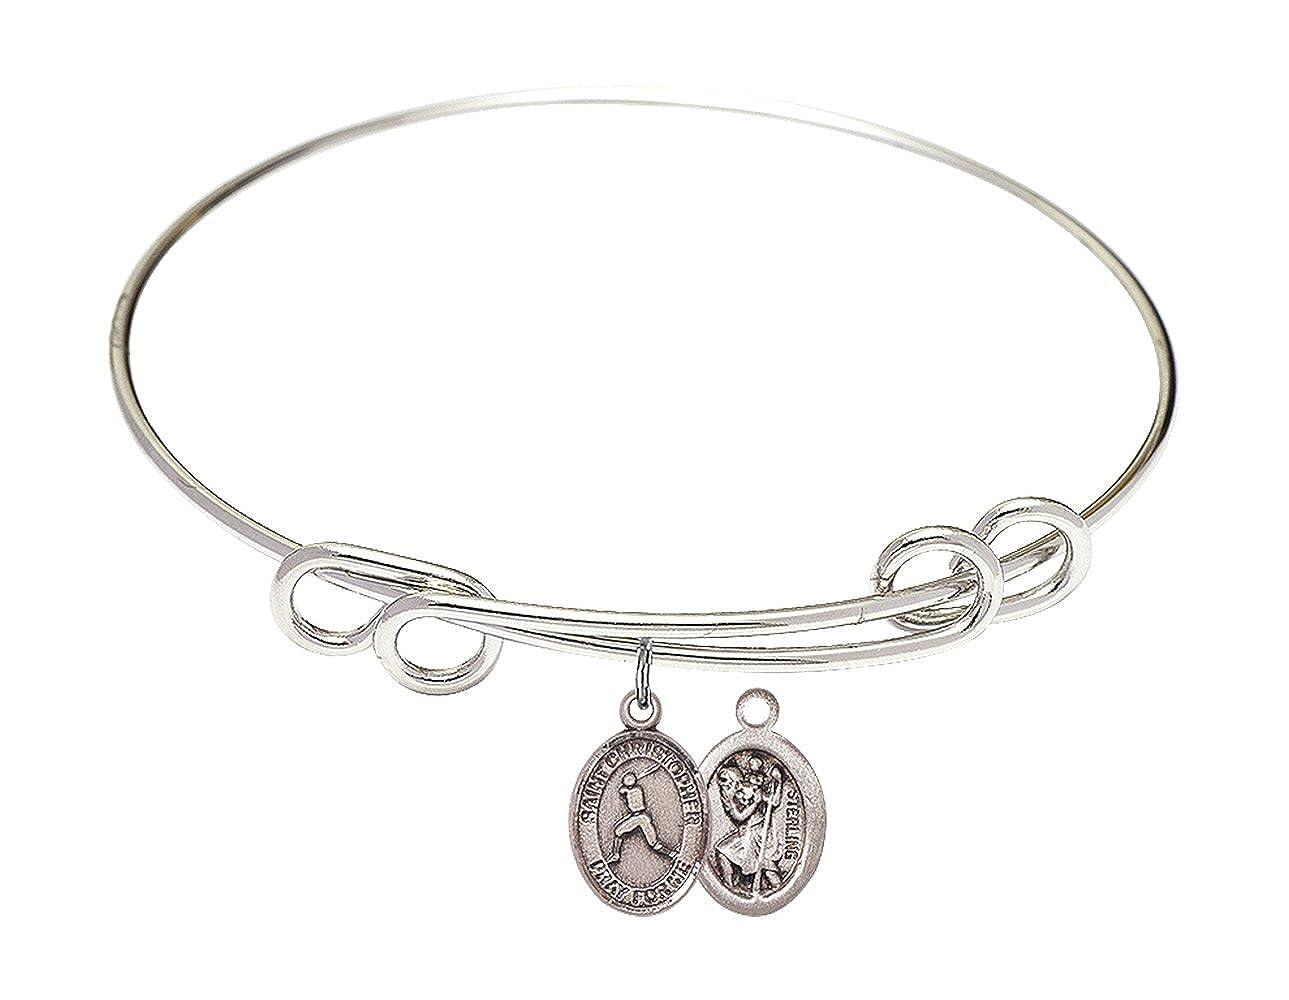 Christopher//Baseball Charm. DiamondJewelryNY Double Loop Bangle Bracelet with a St